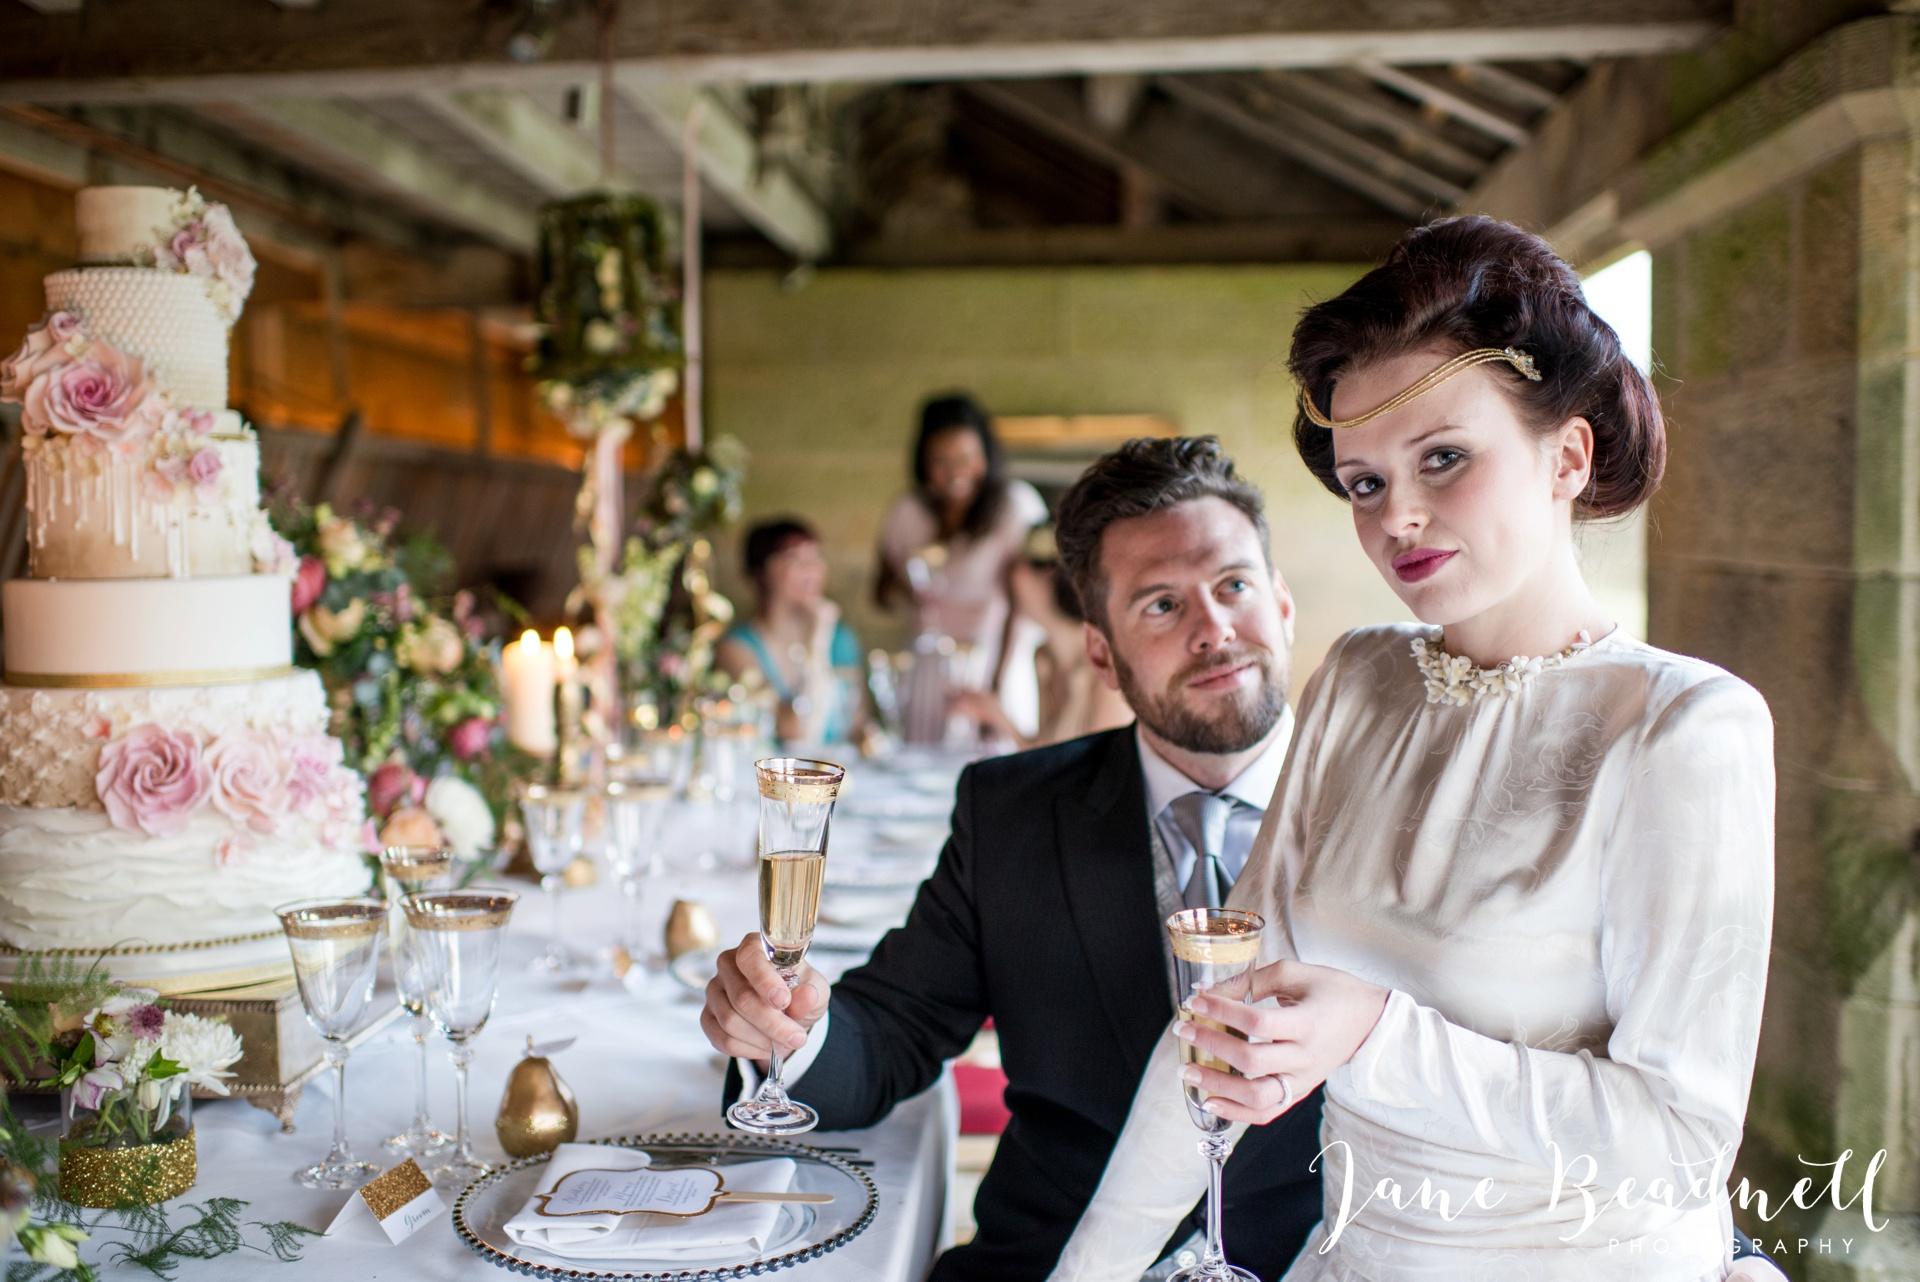 Jane Beadnell fine art wedding photographer Swinton Park25